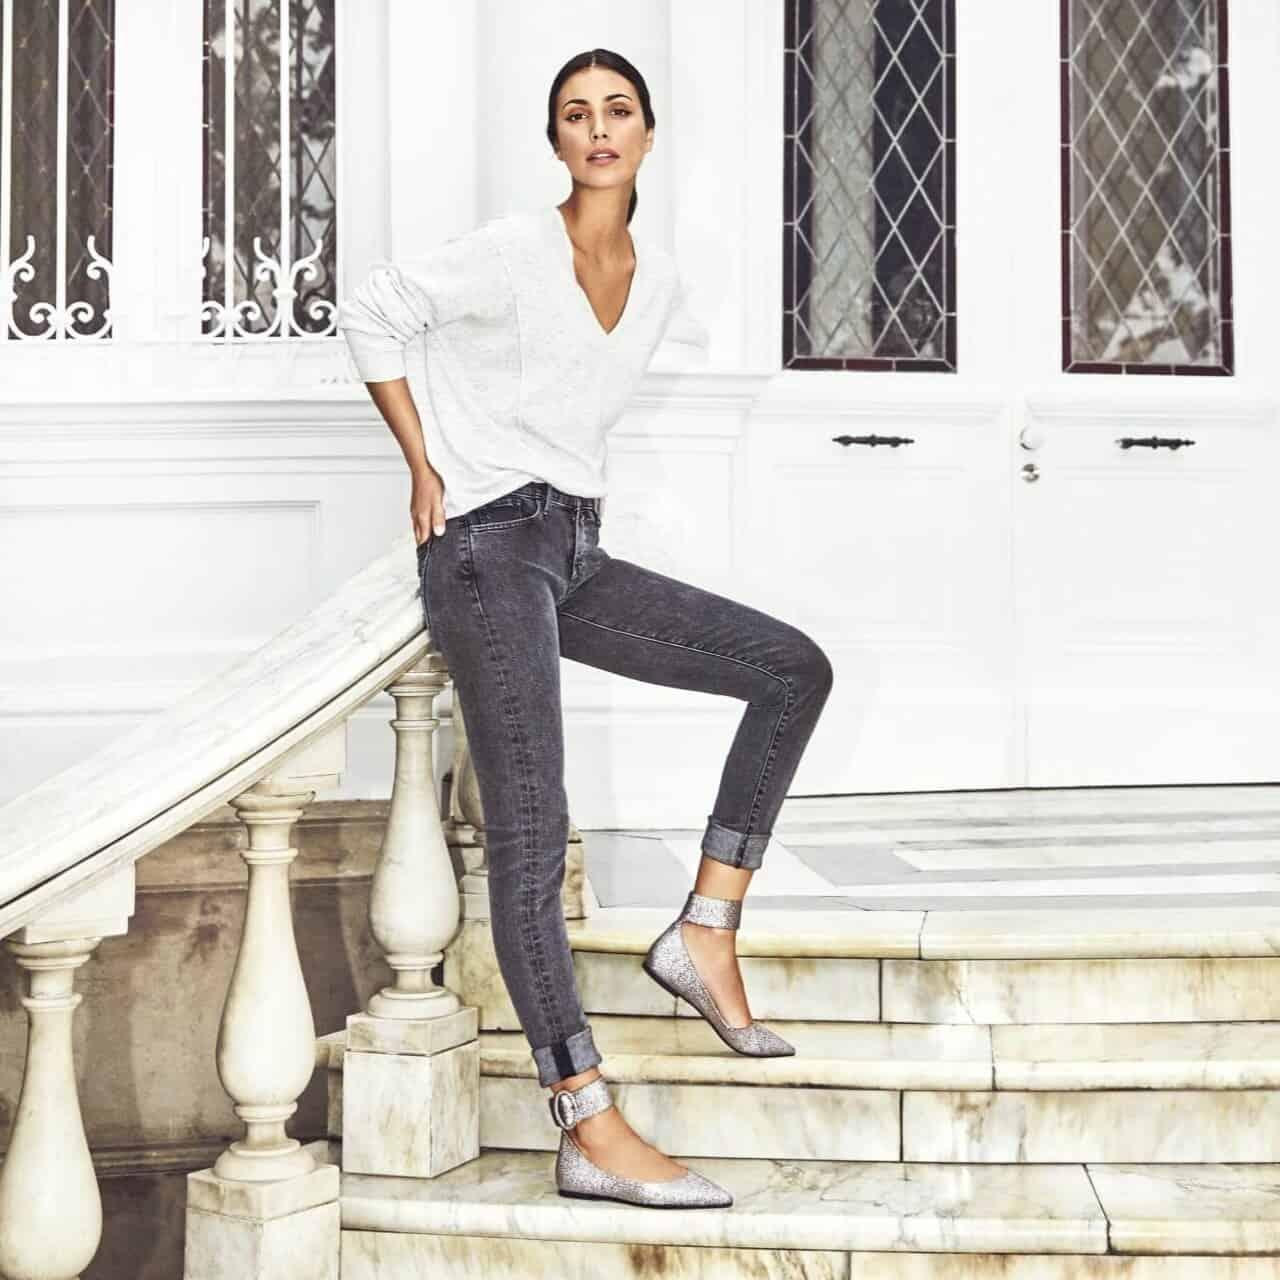 Pretty Ballerinas winter 2018 | פריטי בלרינס חורף 2018 | Saasa De Osma